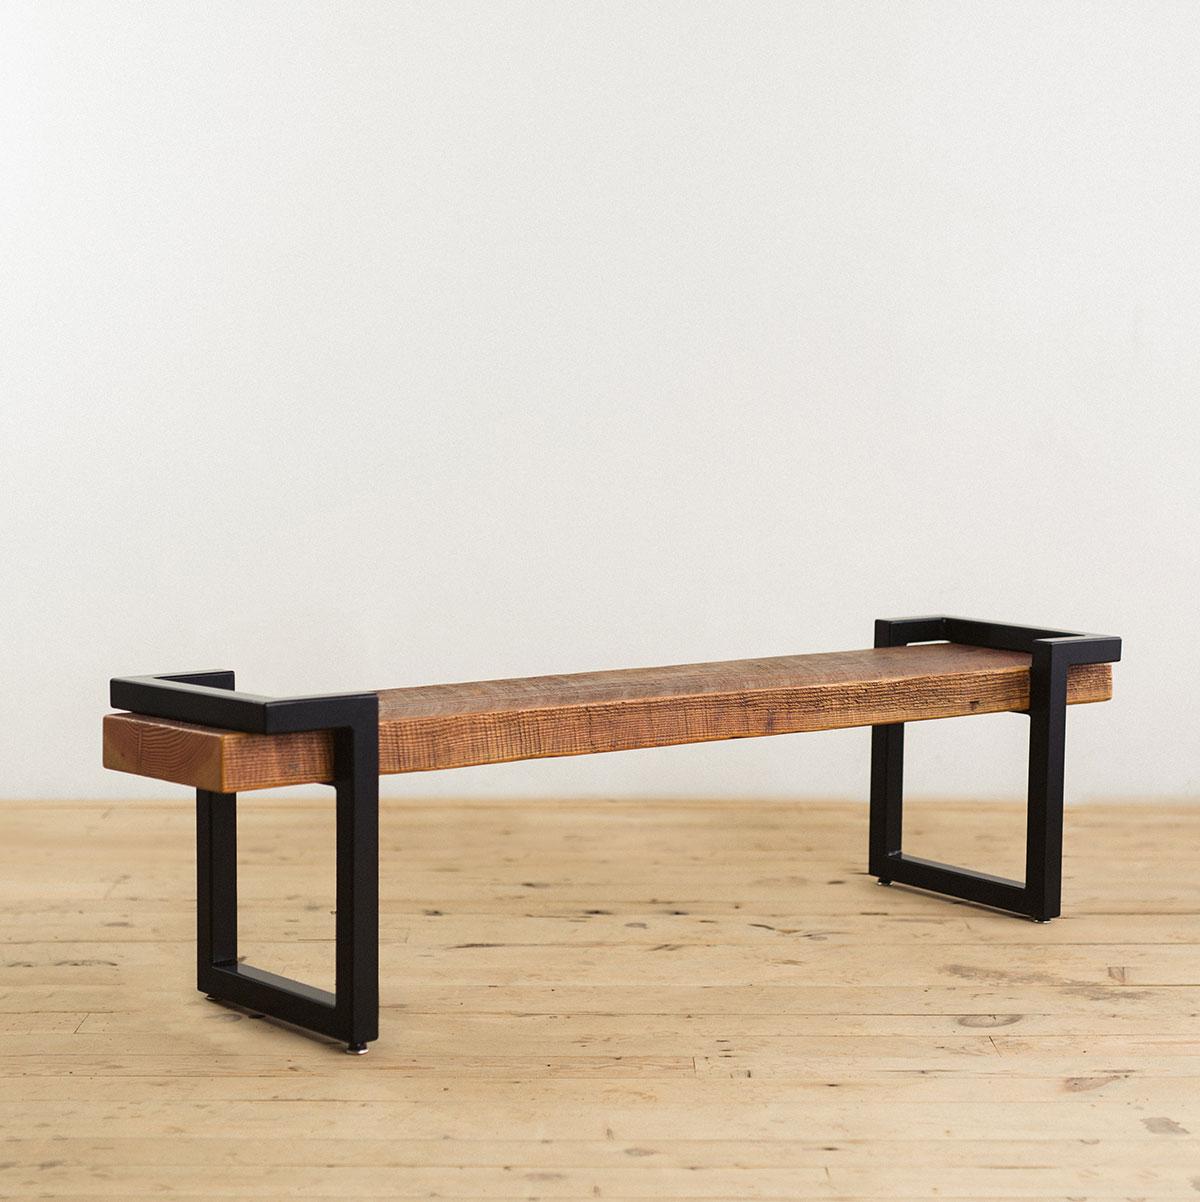 steel-salvage-barn-wood-bench-black